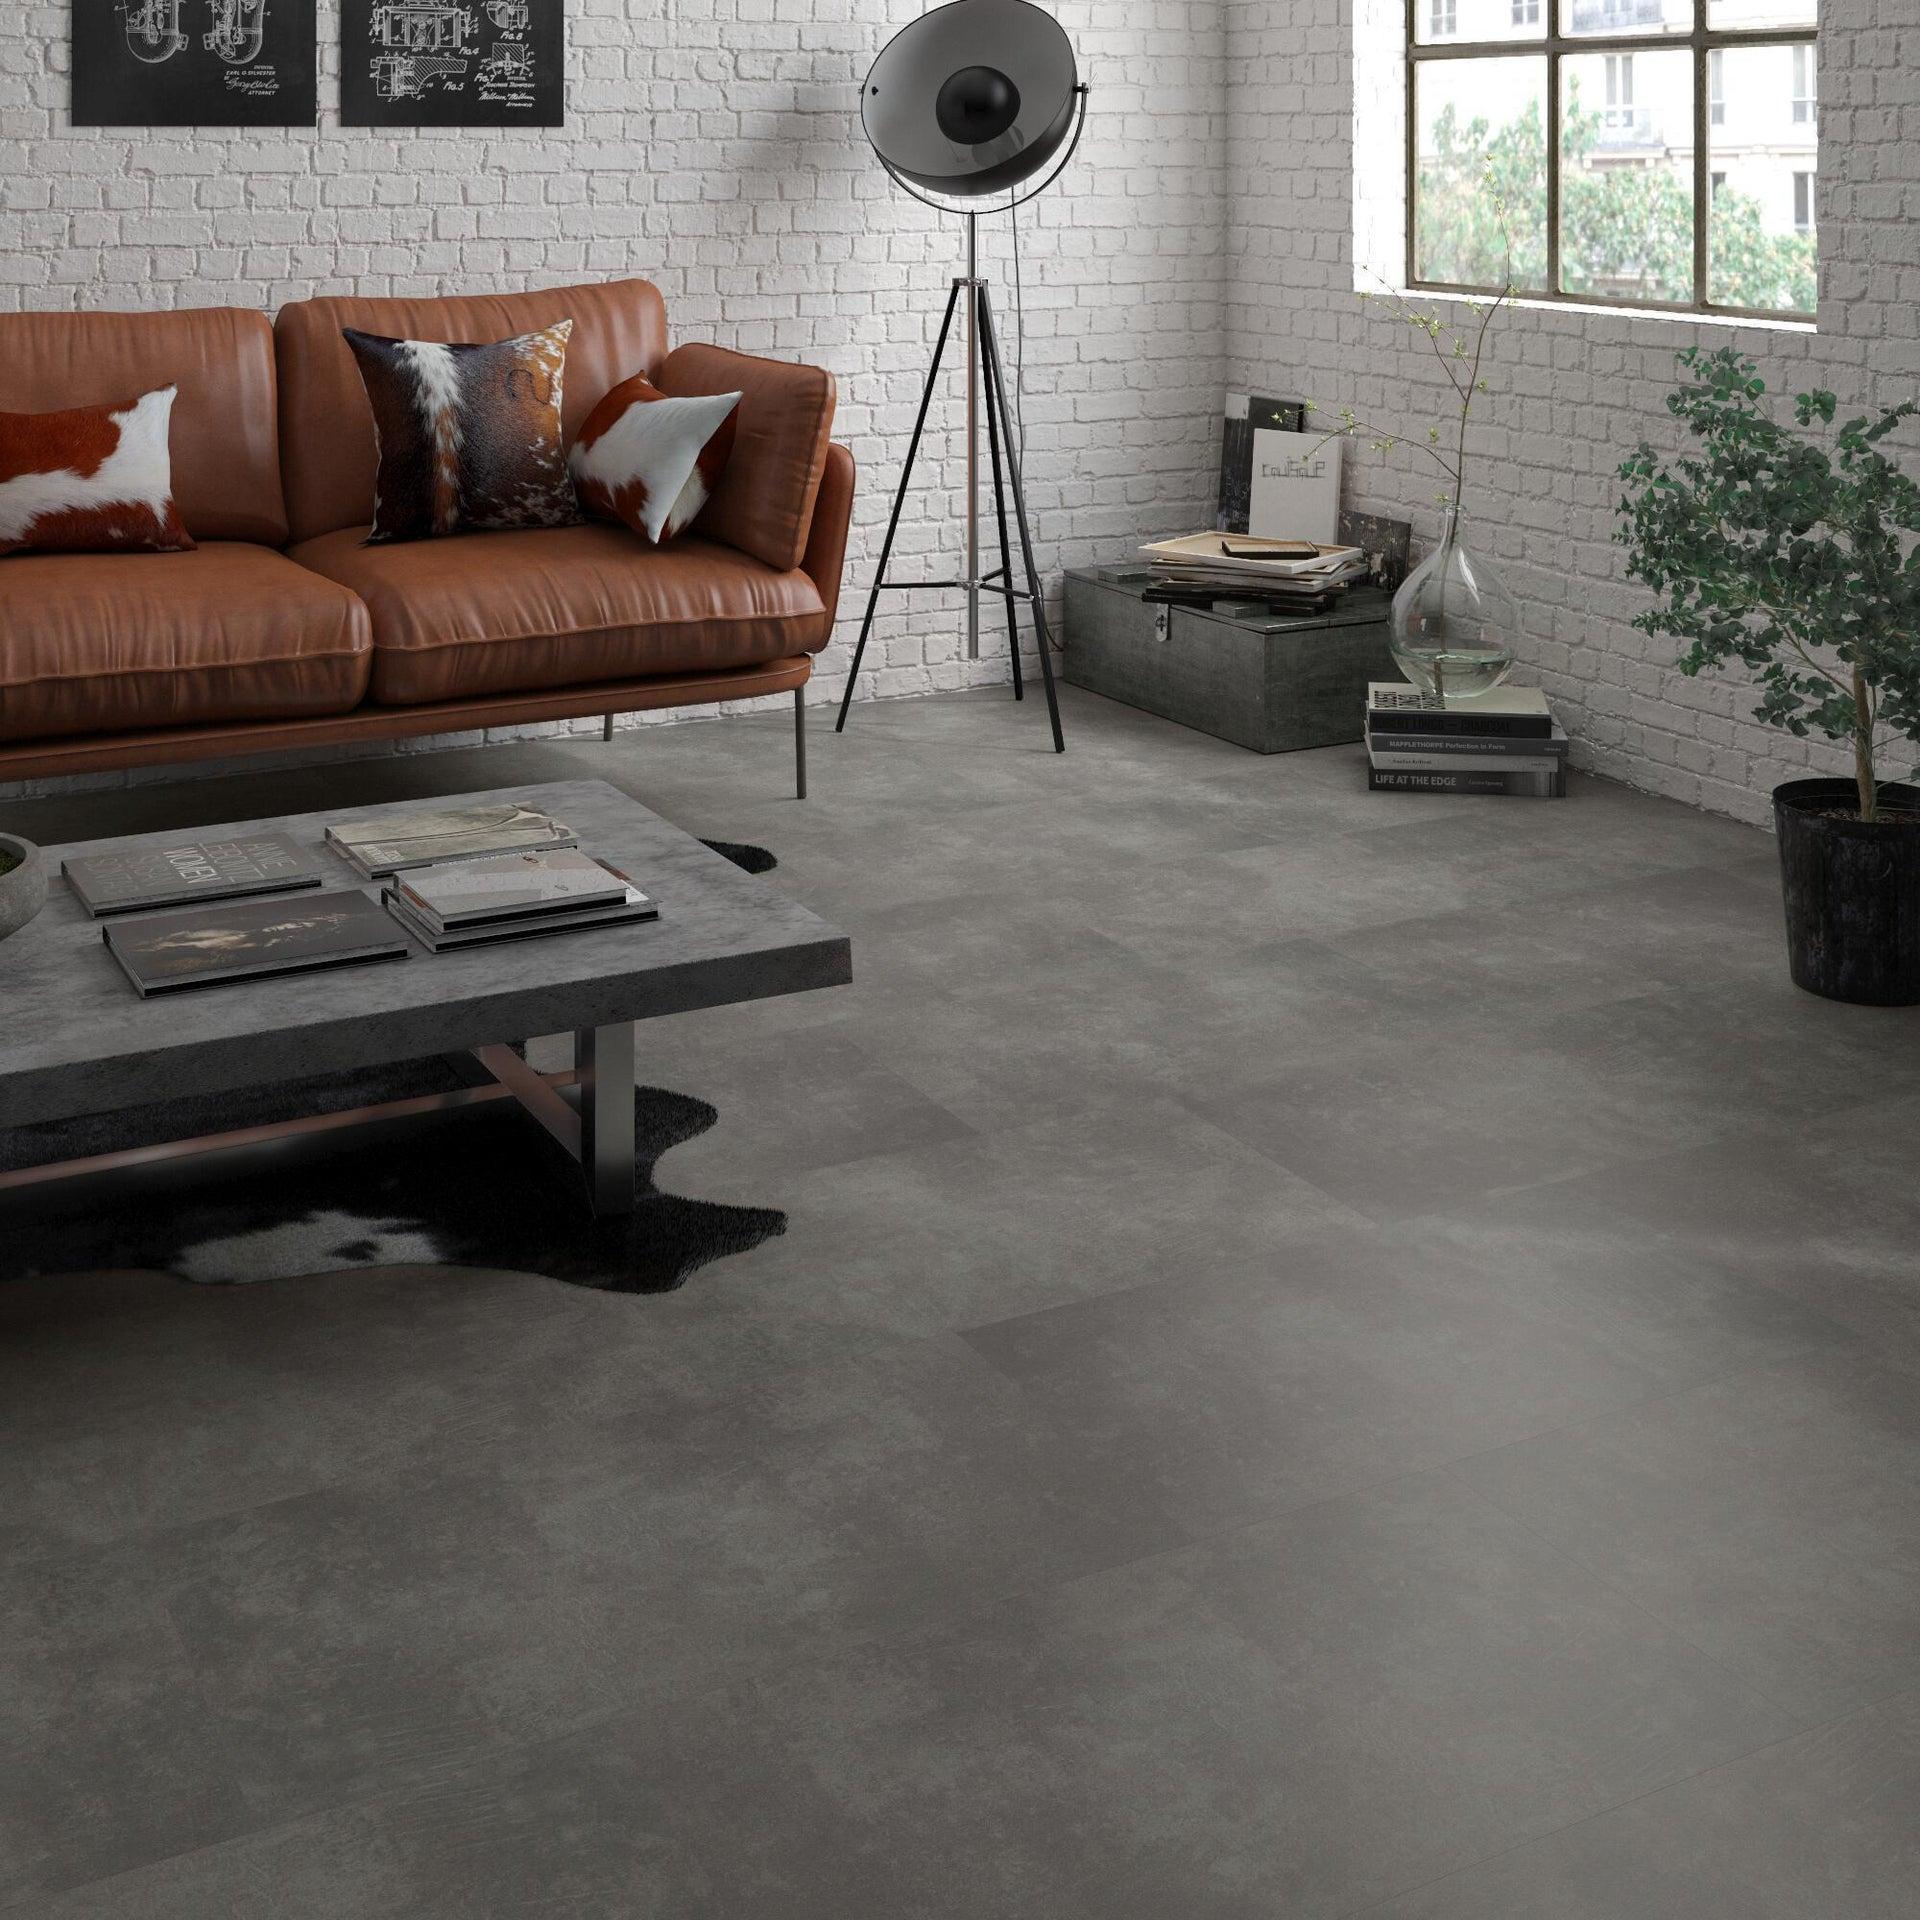 Pavimento PVC incastro Tolu Sp 4 mm grigio / argento - 3